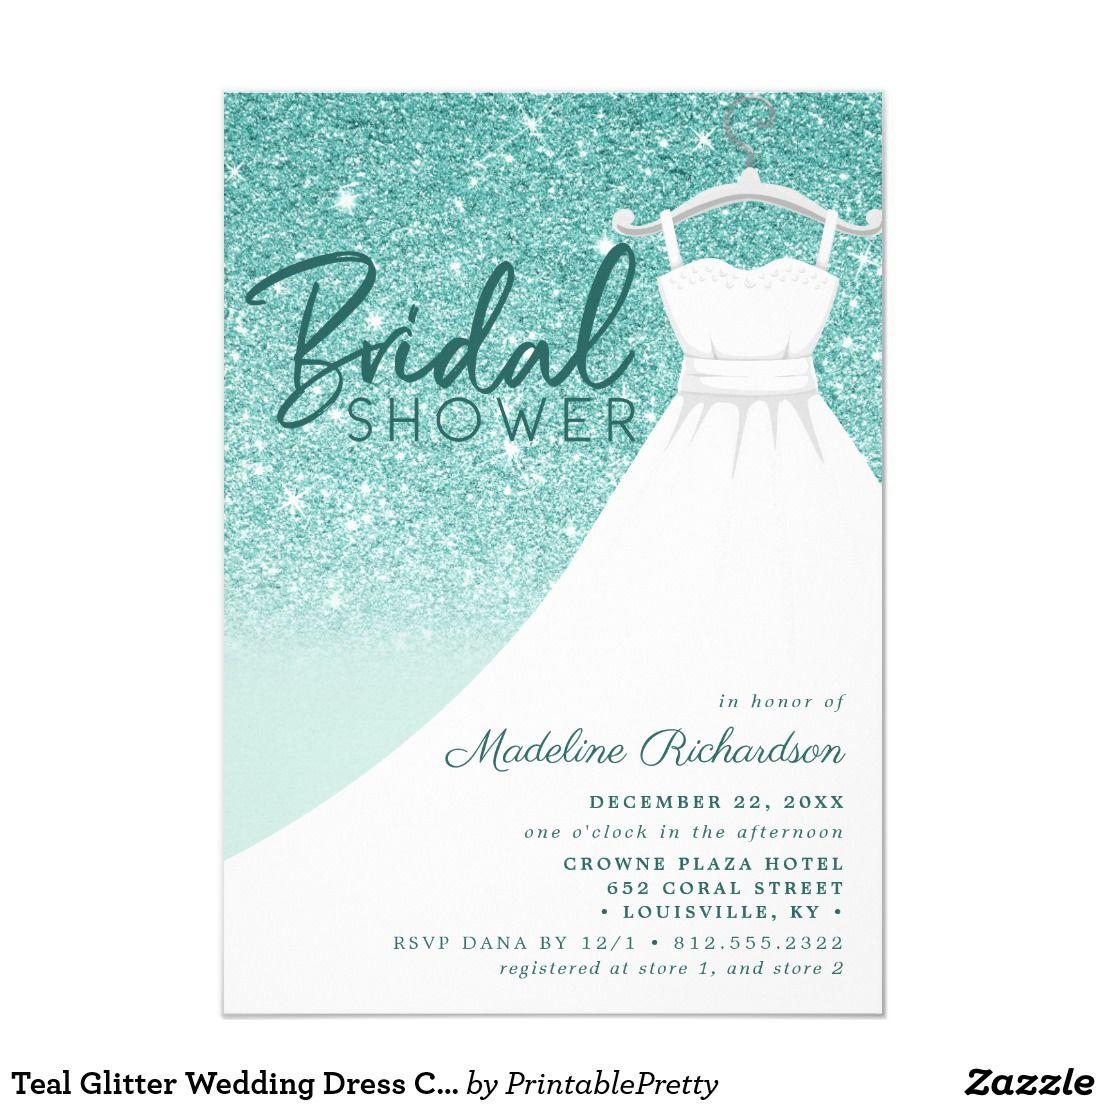 Teal Glitter Wedding Dress Chic Bridal Shower Invitation Zazzle Com Glitter Wedding Bridal Shower Invitations Chic Bridal Showers